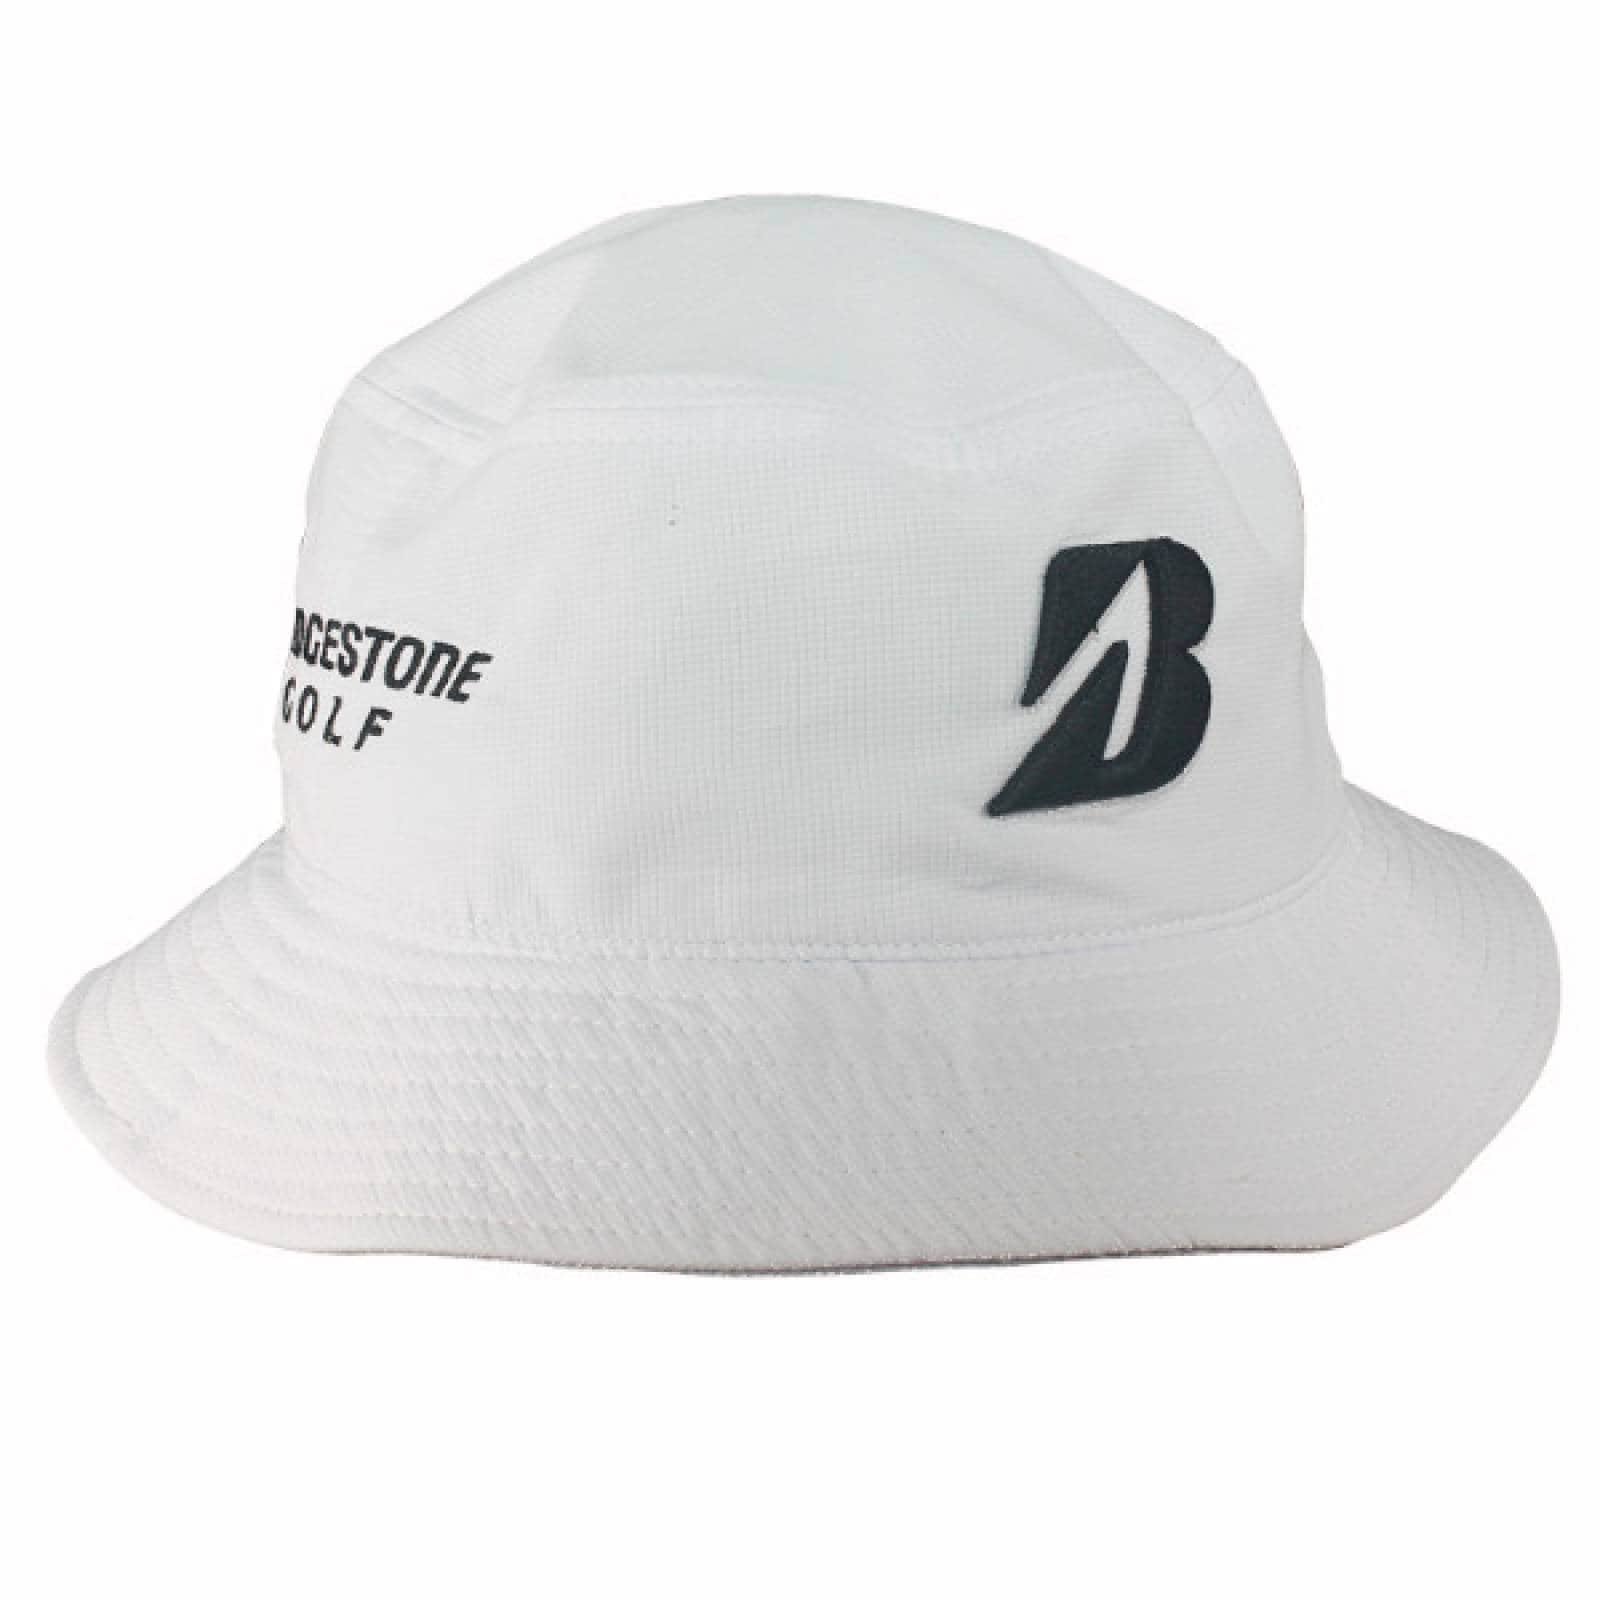 Sombrero Bridgestone Golf Bucket Hat